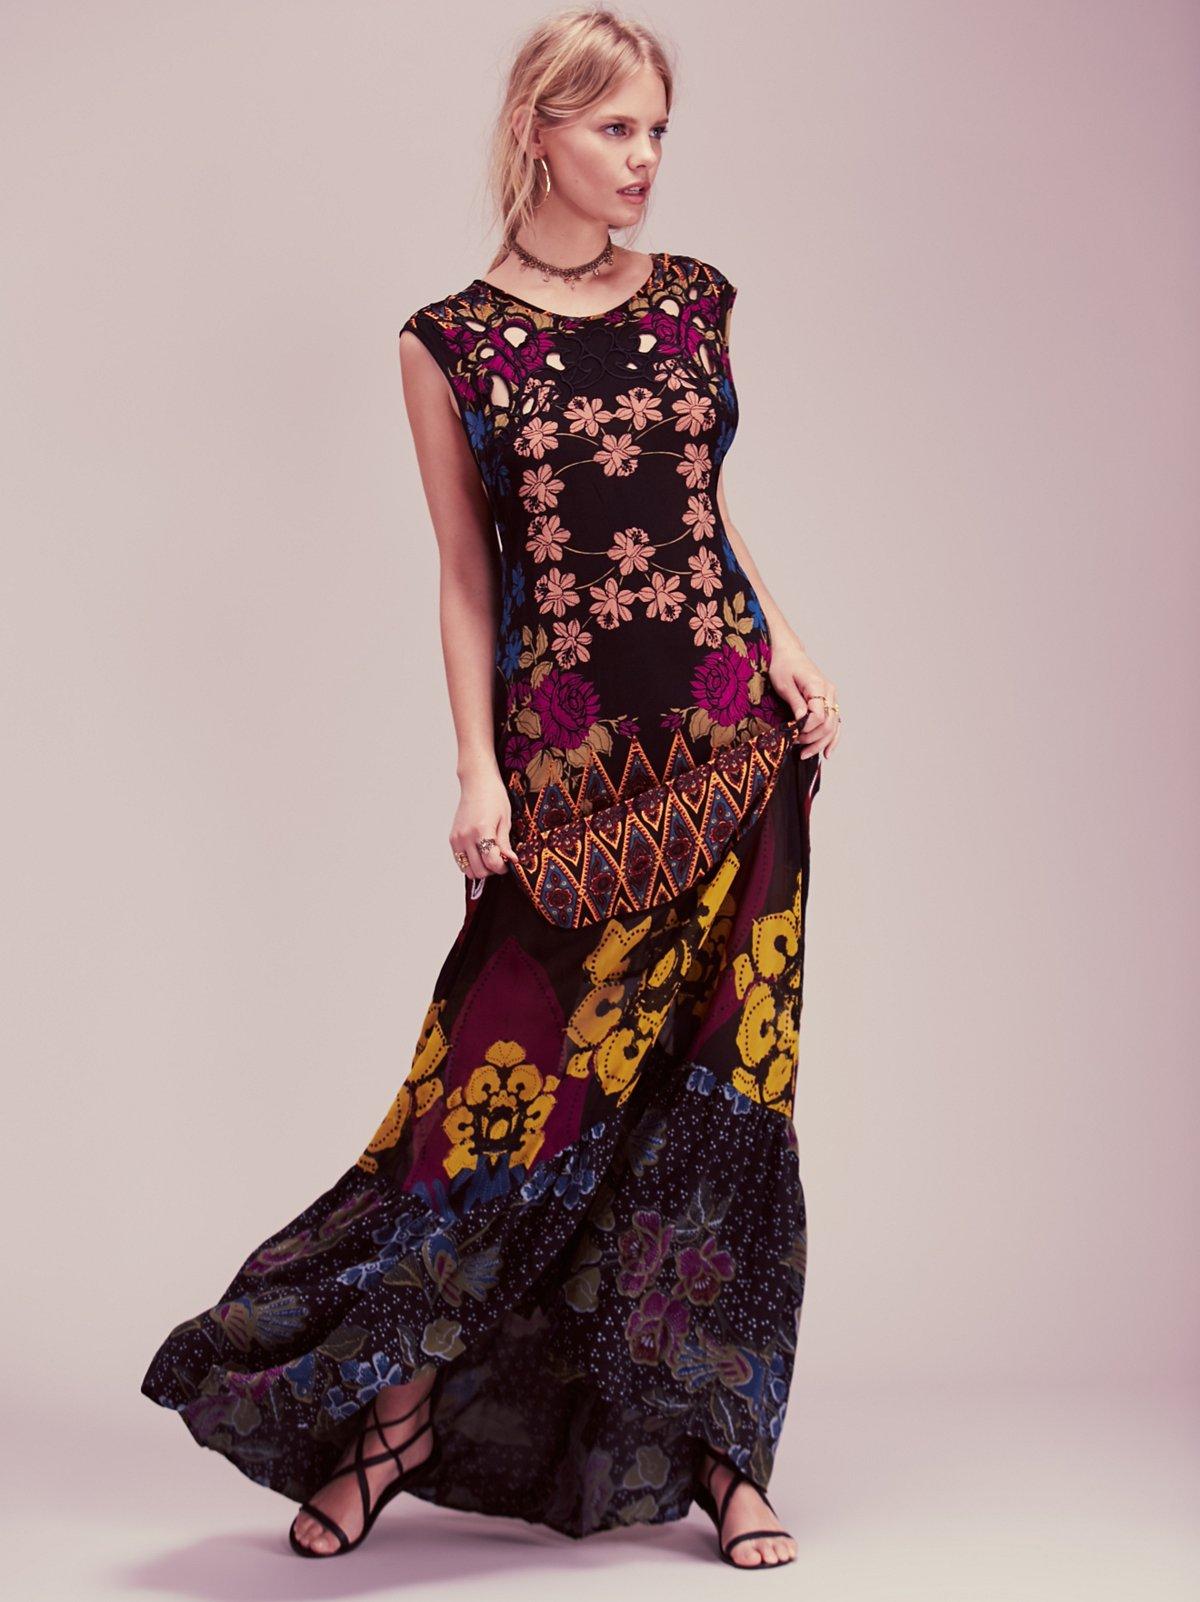 Bali Bali连衣裙